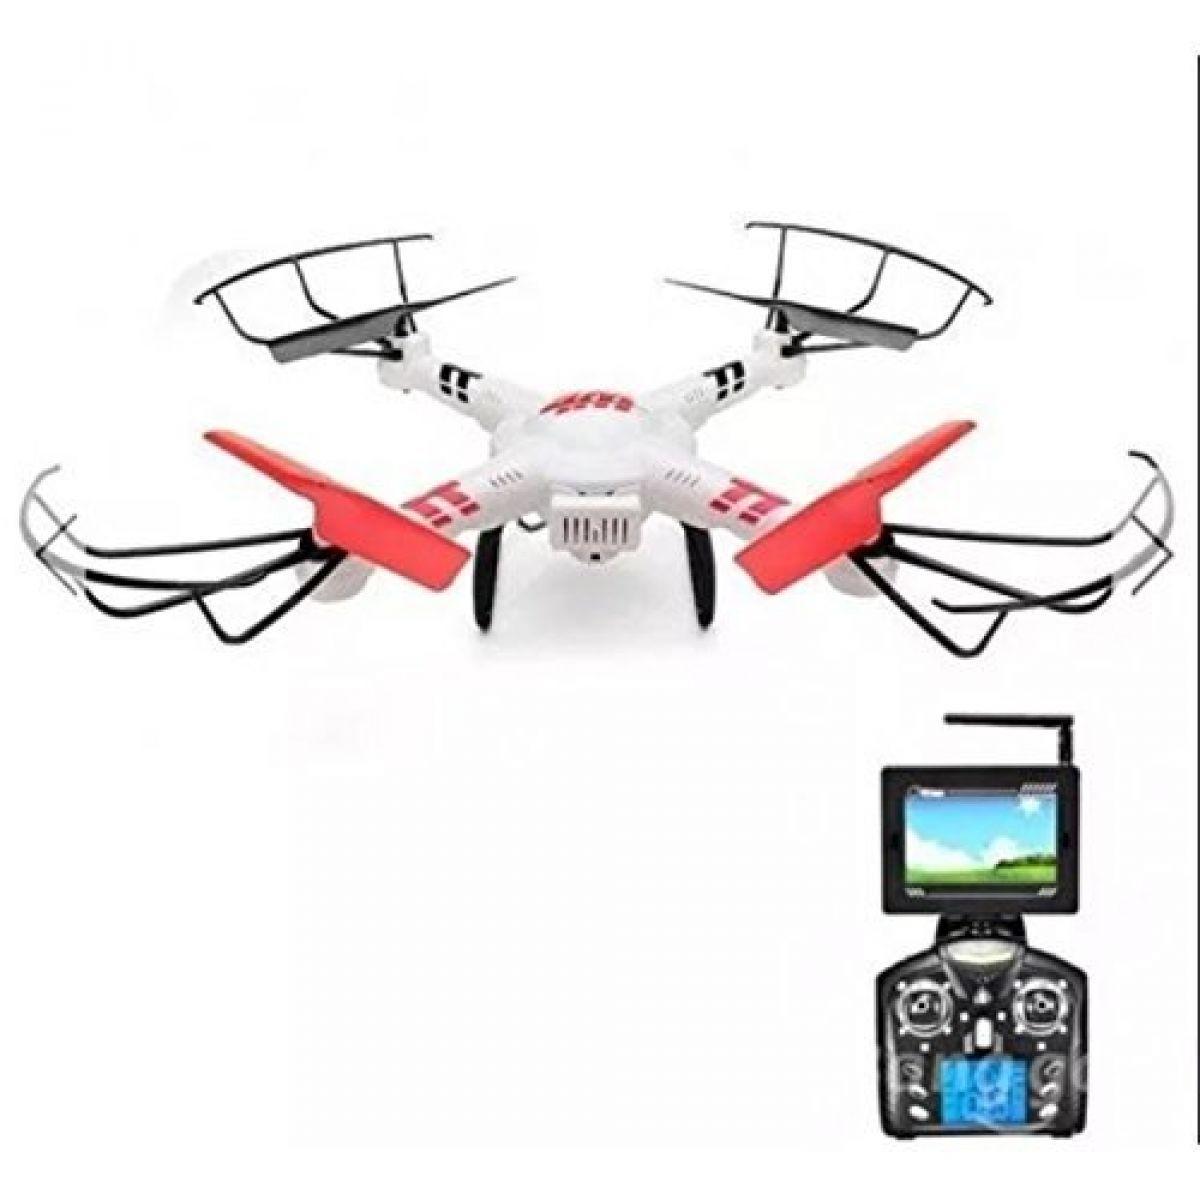 Quadcopter video hd 720p - kamera wltoys rc helikopter - drohne v686 v686g 5.8g fpv